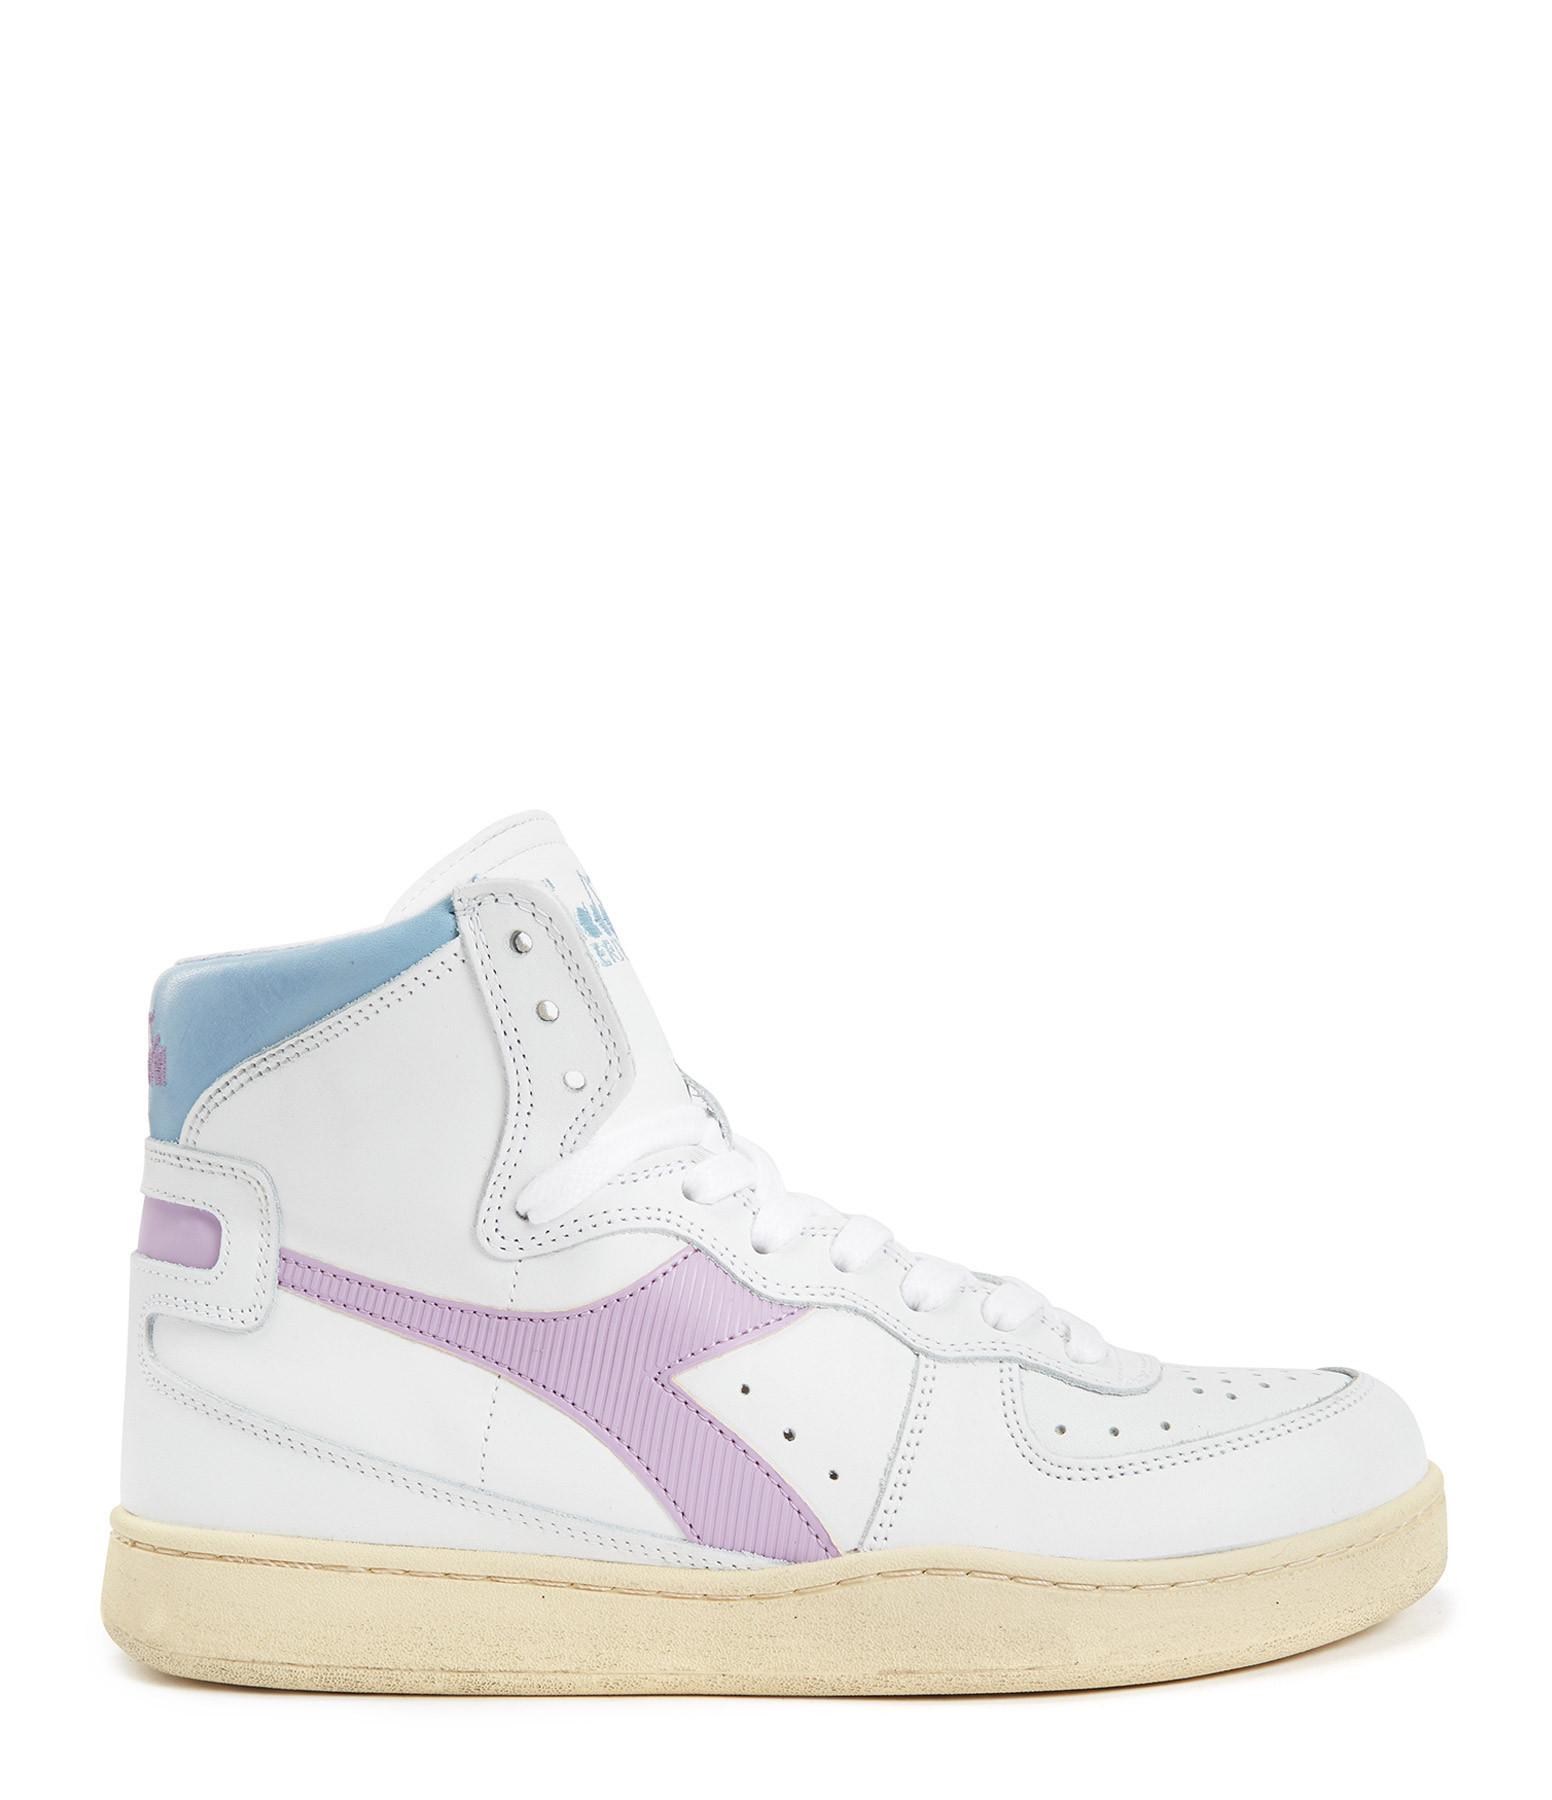 DIADORA - Baskets Mi Basket Used Blanc Violet